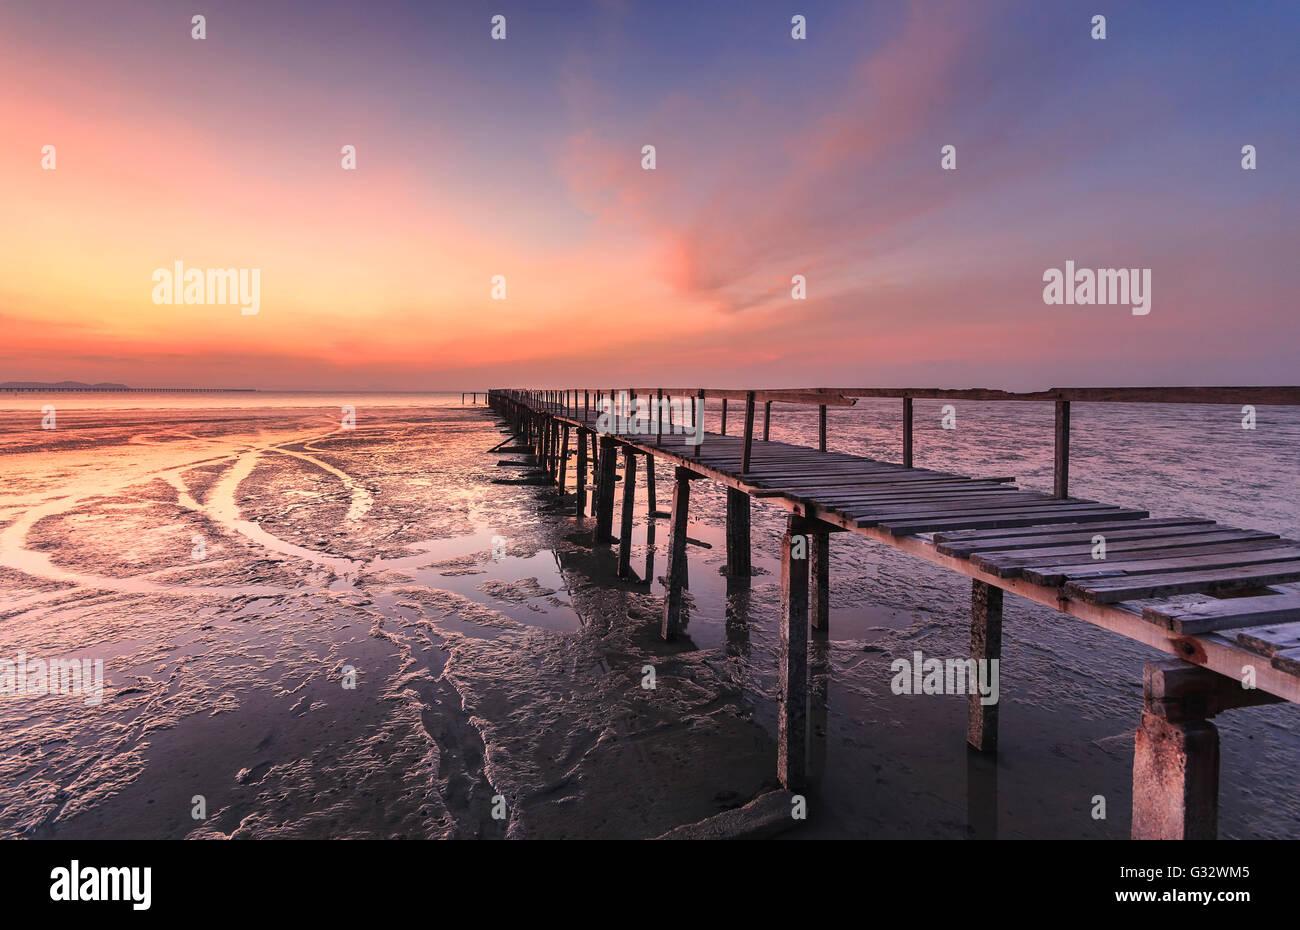 Abandon Jetty at sunrise, Teluk Tem, Penang, Malaysia - Stock Image